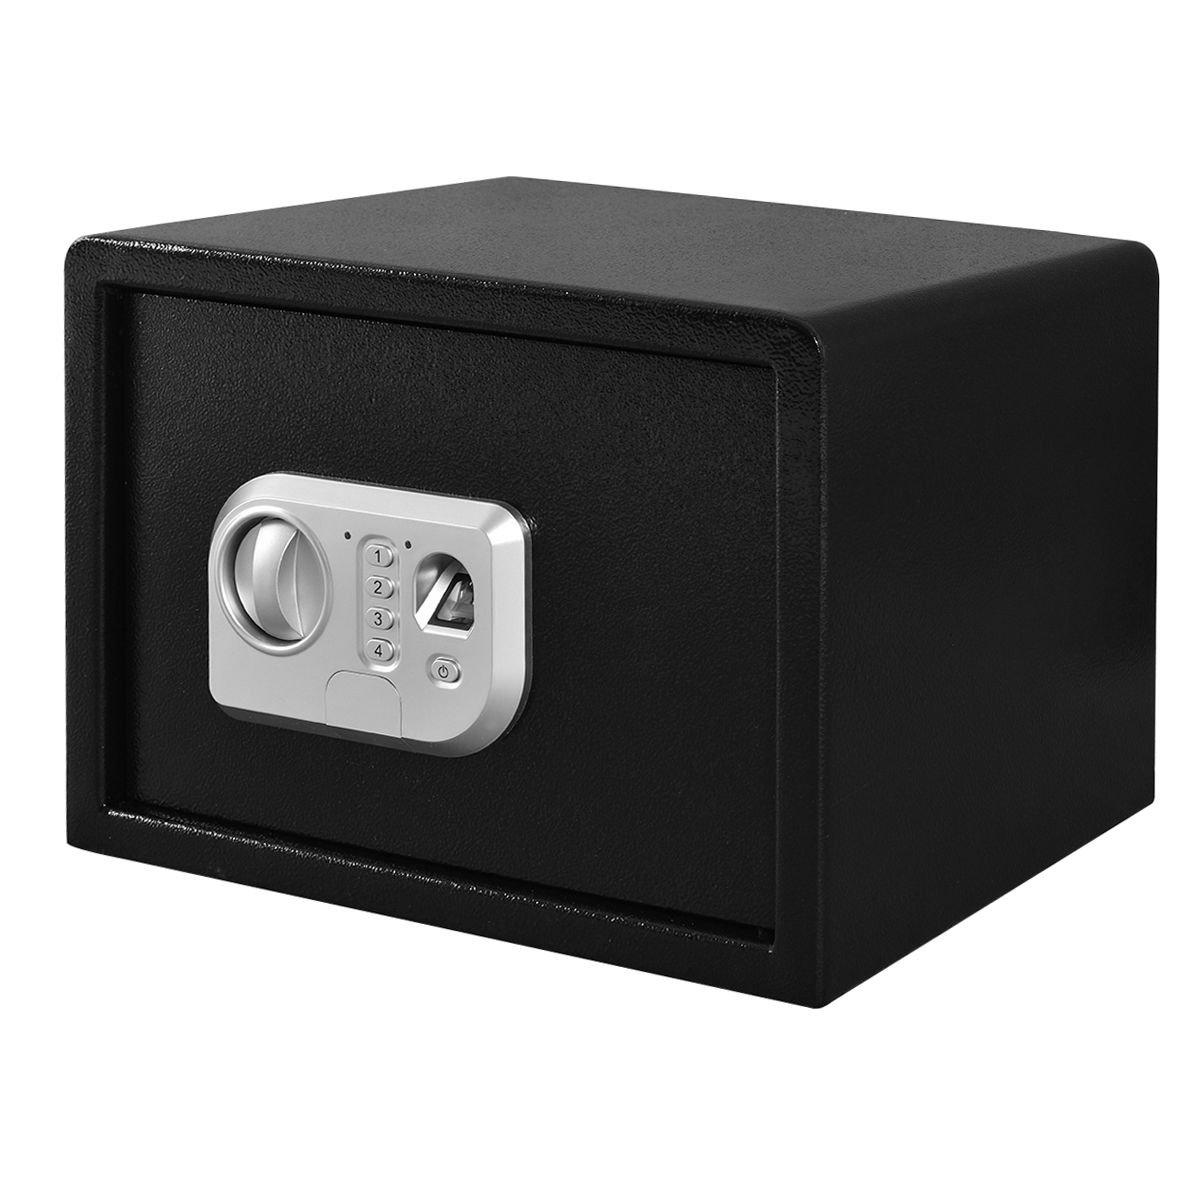 Giantex 14'' Biometric Fingerprint Digital Electronic Gun Safe Box Keypad Lock Security(Without Front Slot)